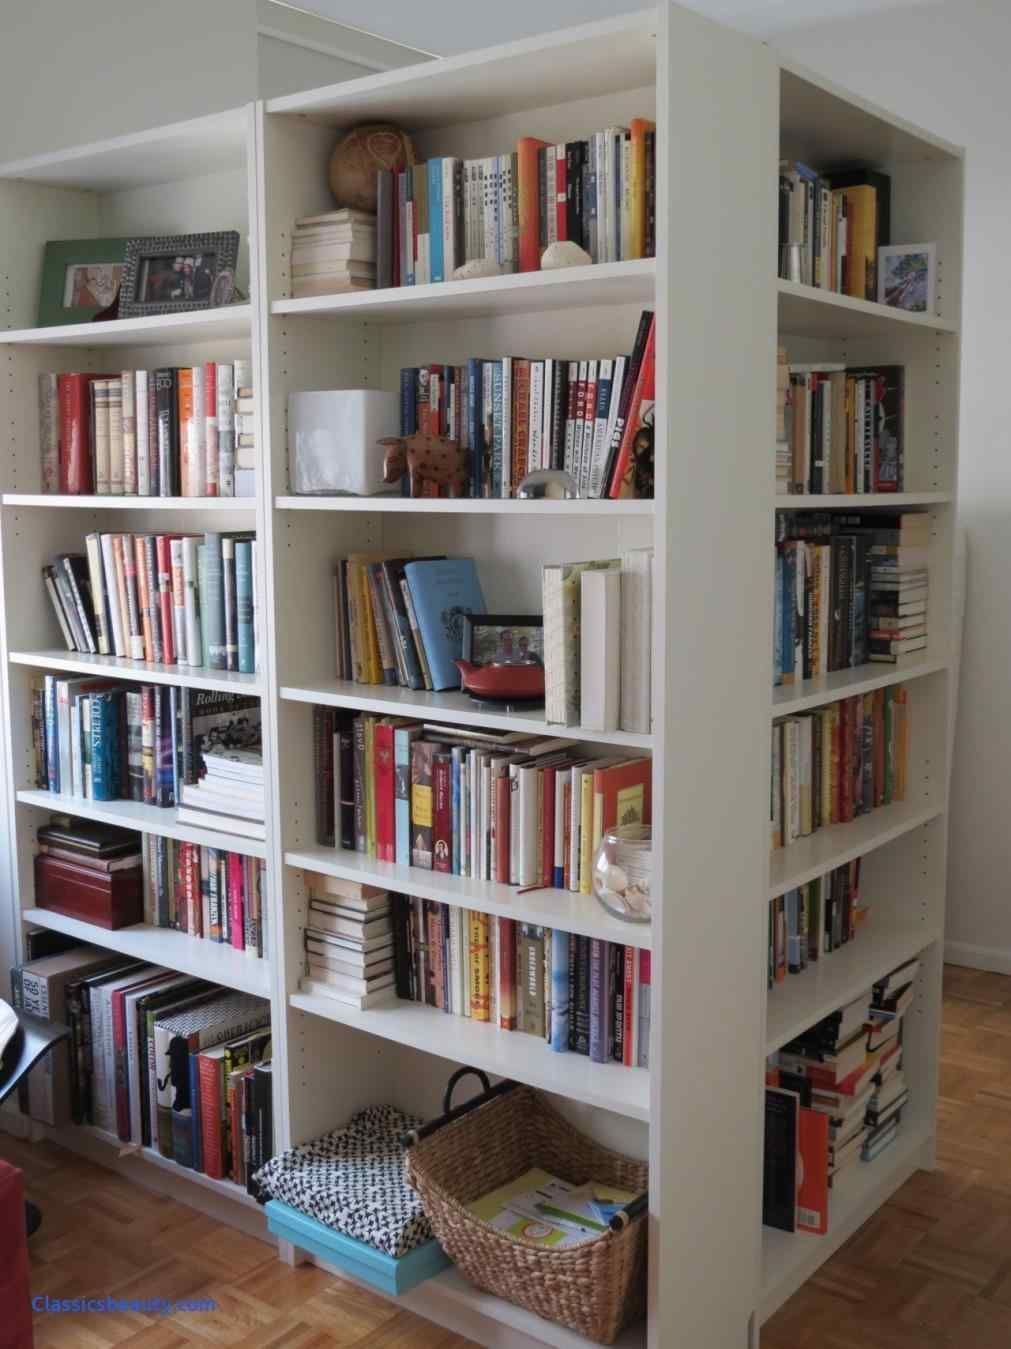 Room Dividers Ideas Ikea: 13 Top Shelving Room Dividers Ikea